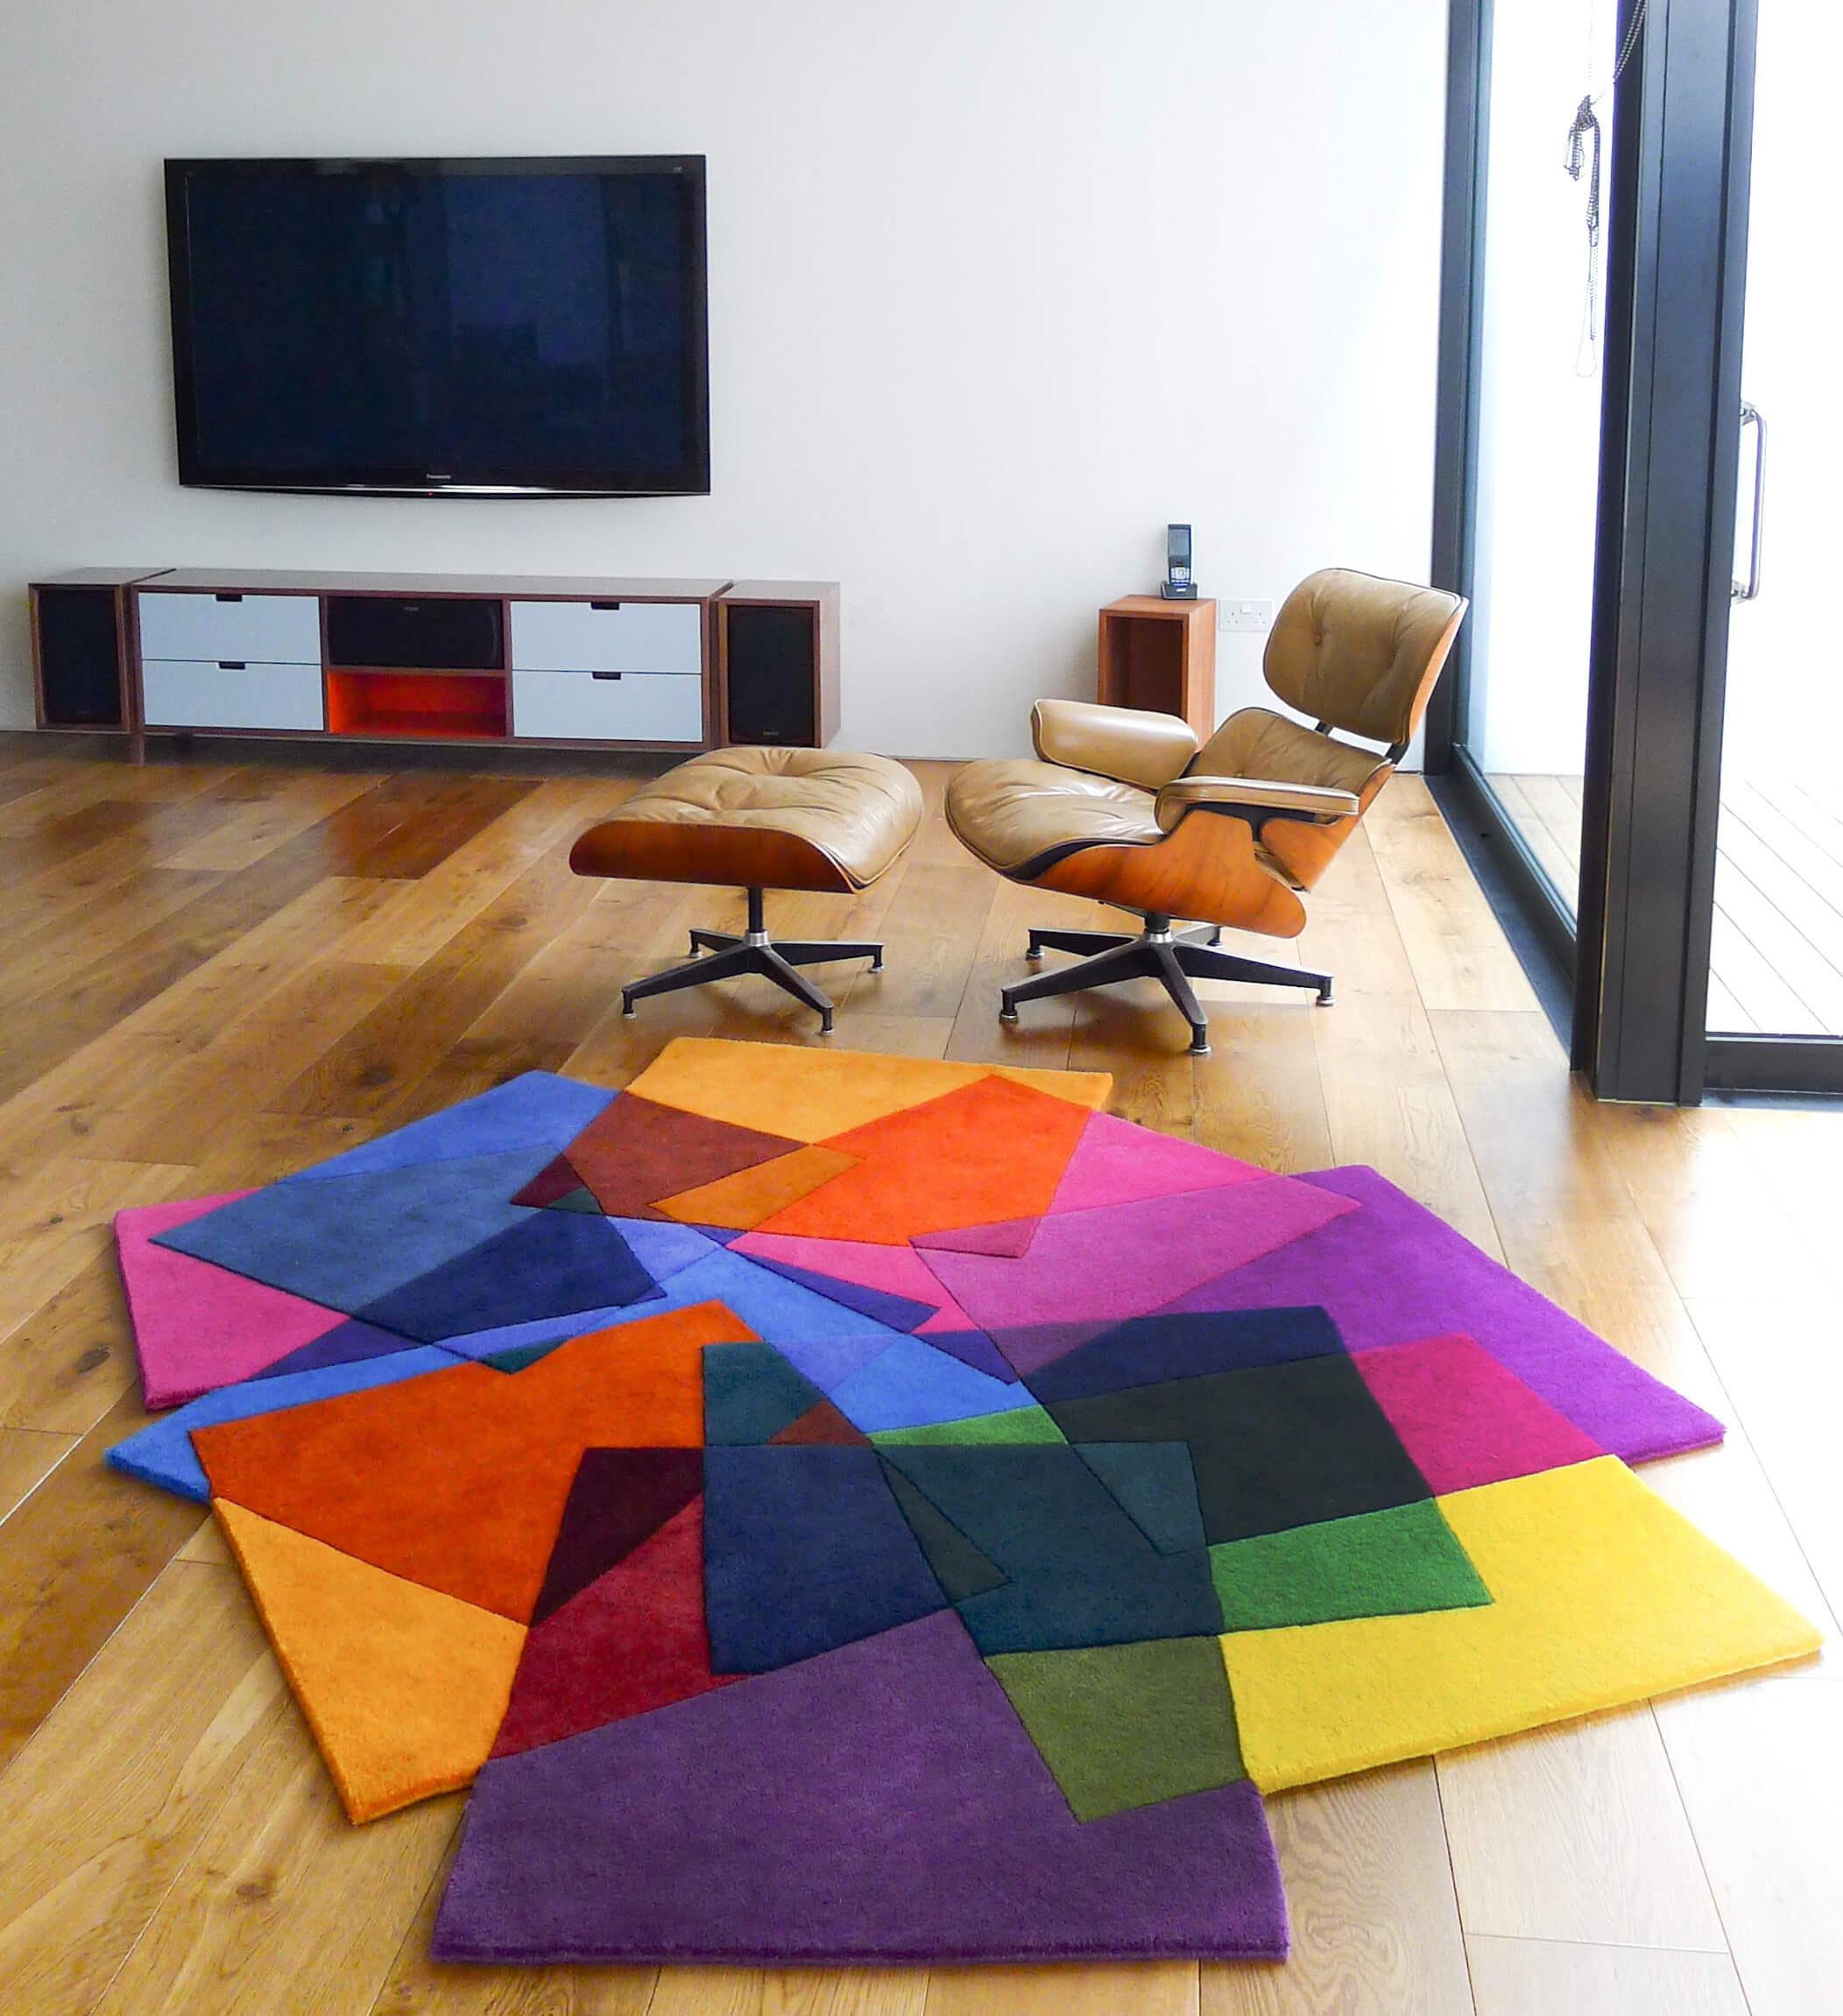 Vibrant-Rug-Designs-by-Sonya-Winner-01